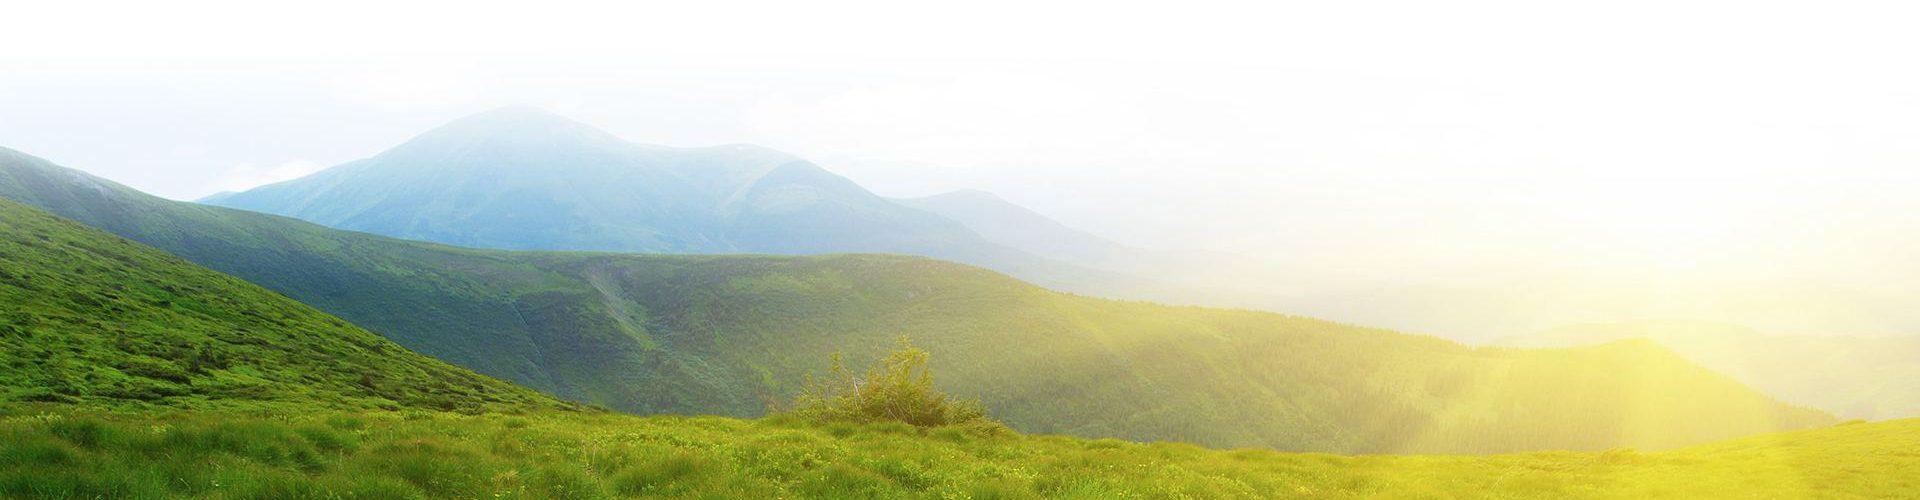 Grassy hills at sunrise.